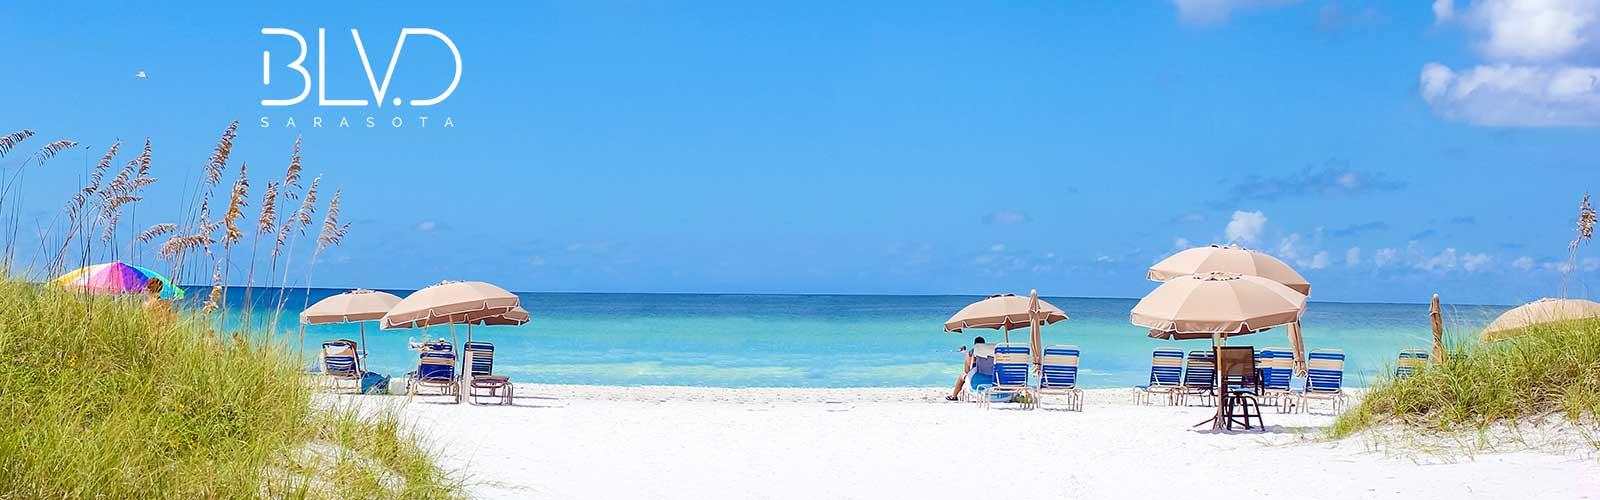 Sarasota beaches - Blvd Sarasota Downtown Sarasota Luxury Condo Siesta Key Beach Number 1 Beach